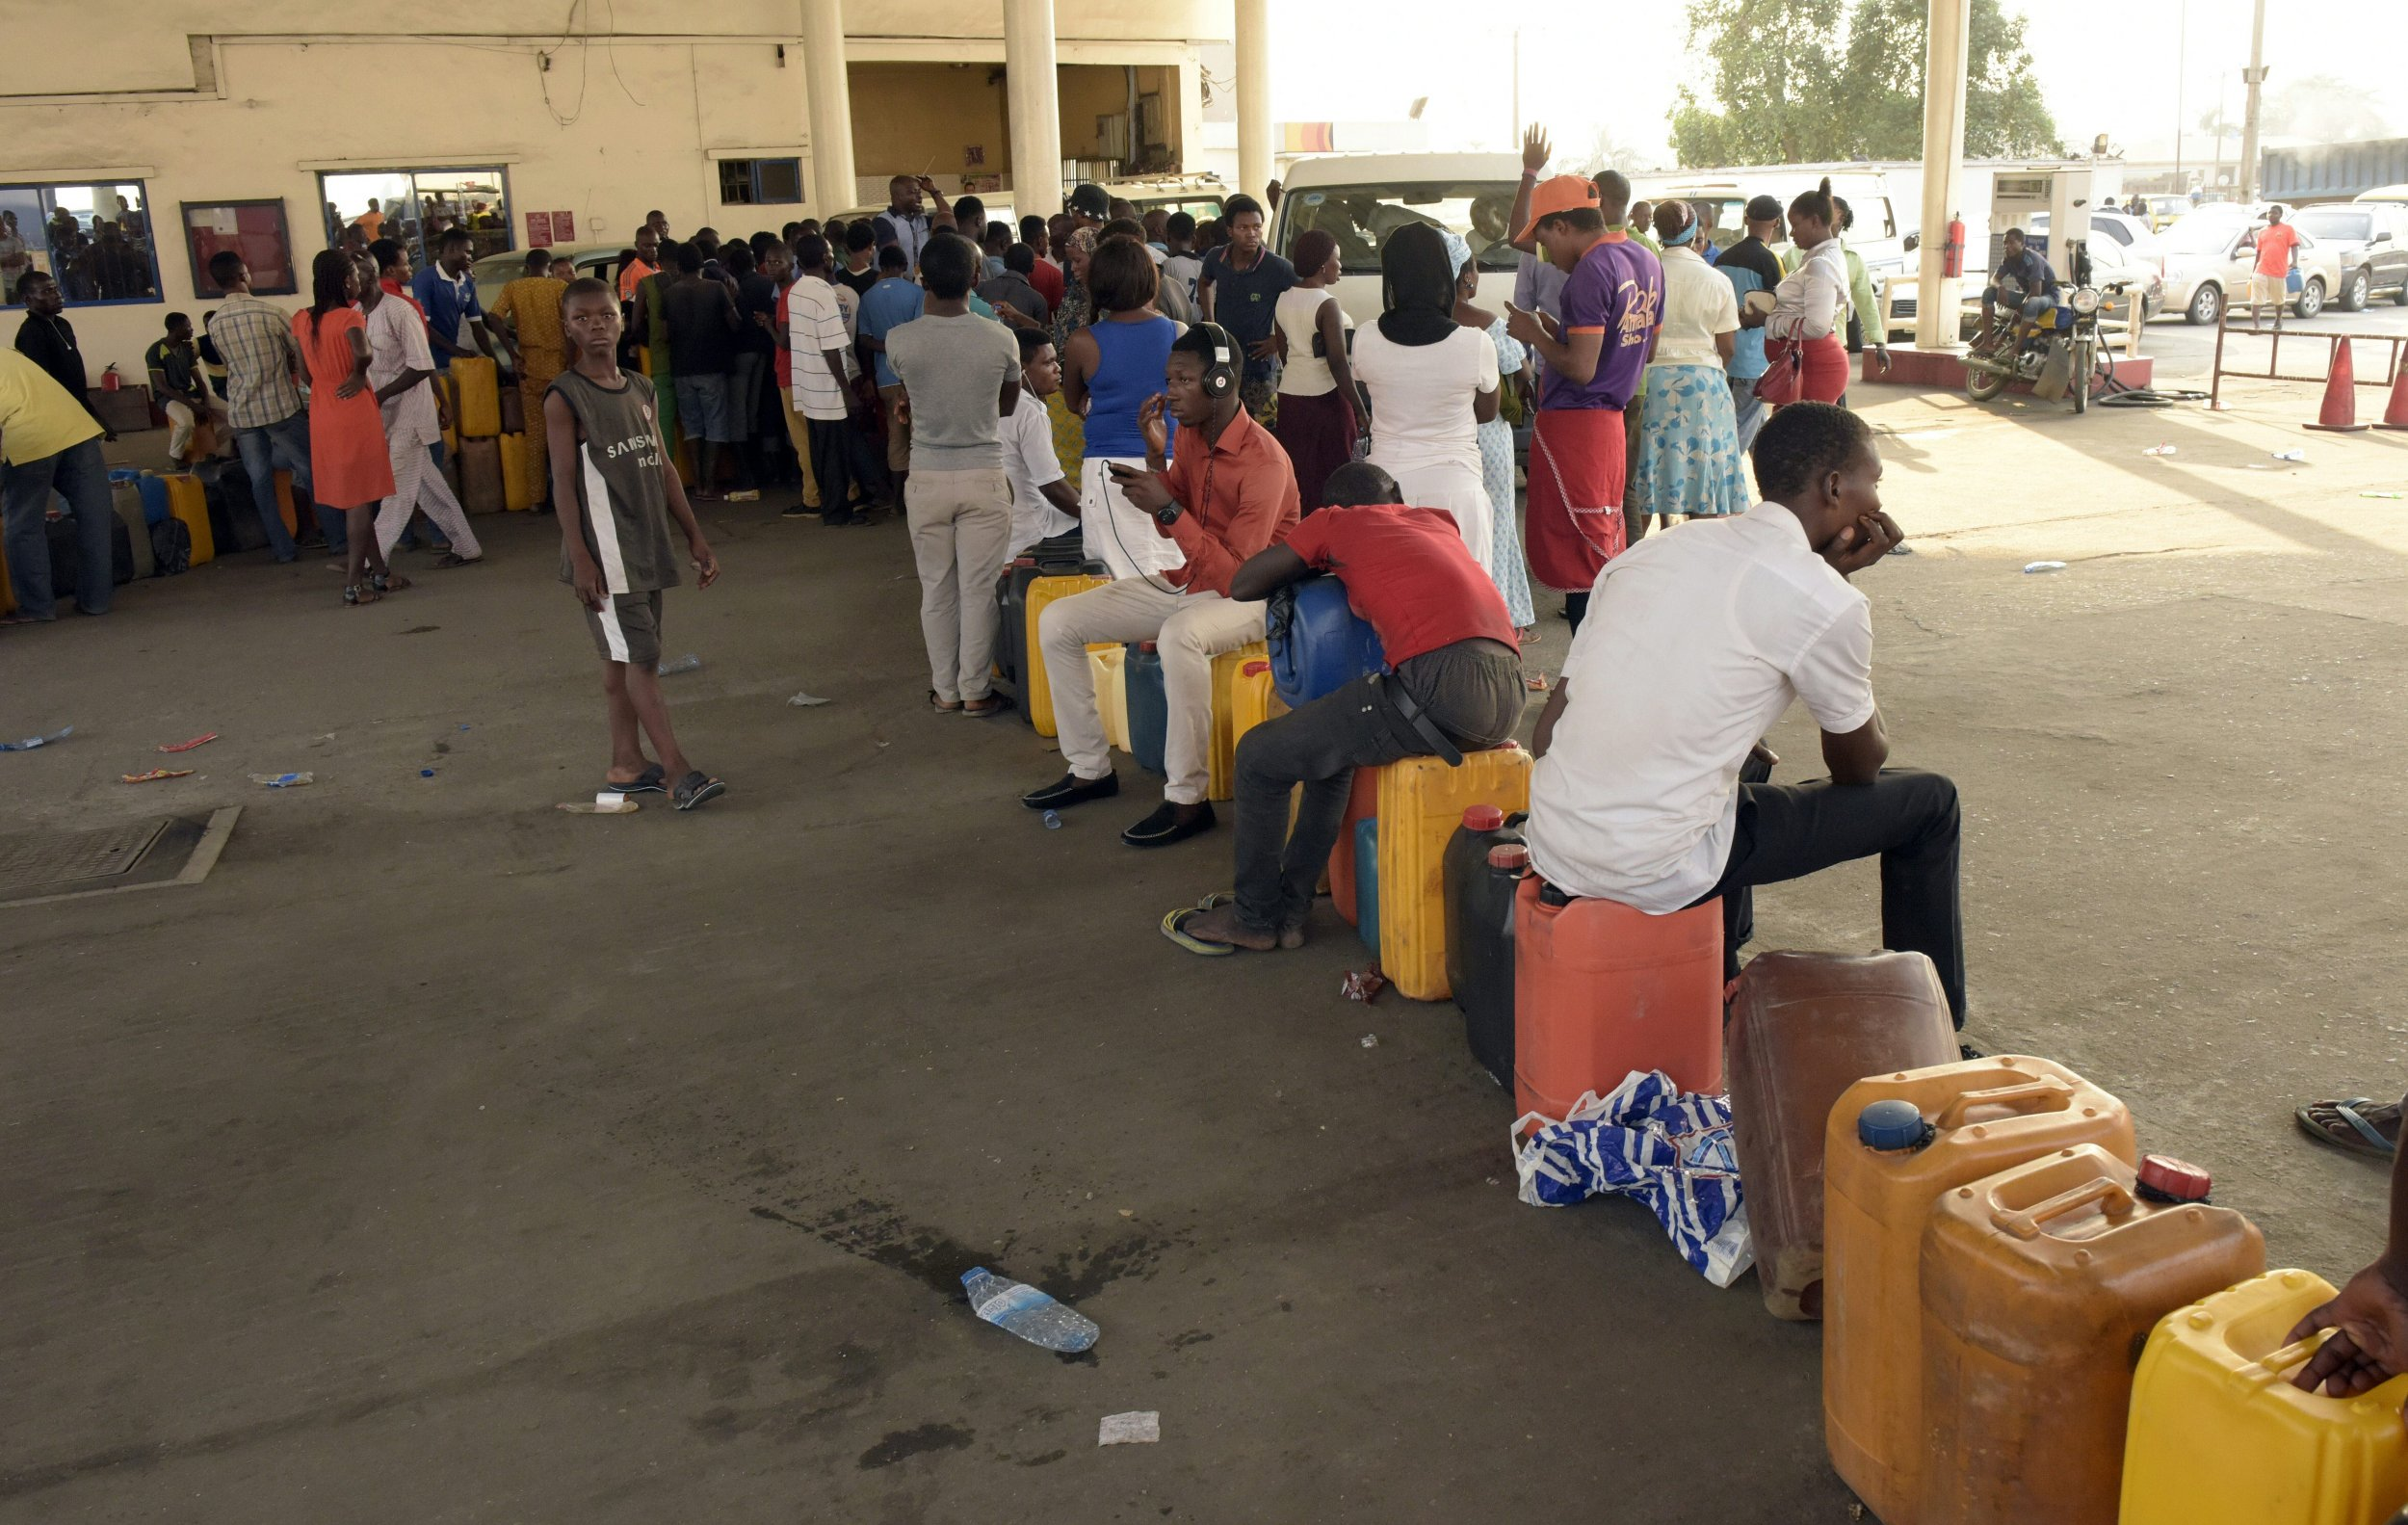 A fuel station line in Lagos, Nigeria.